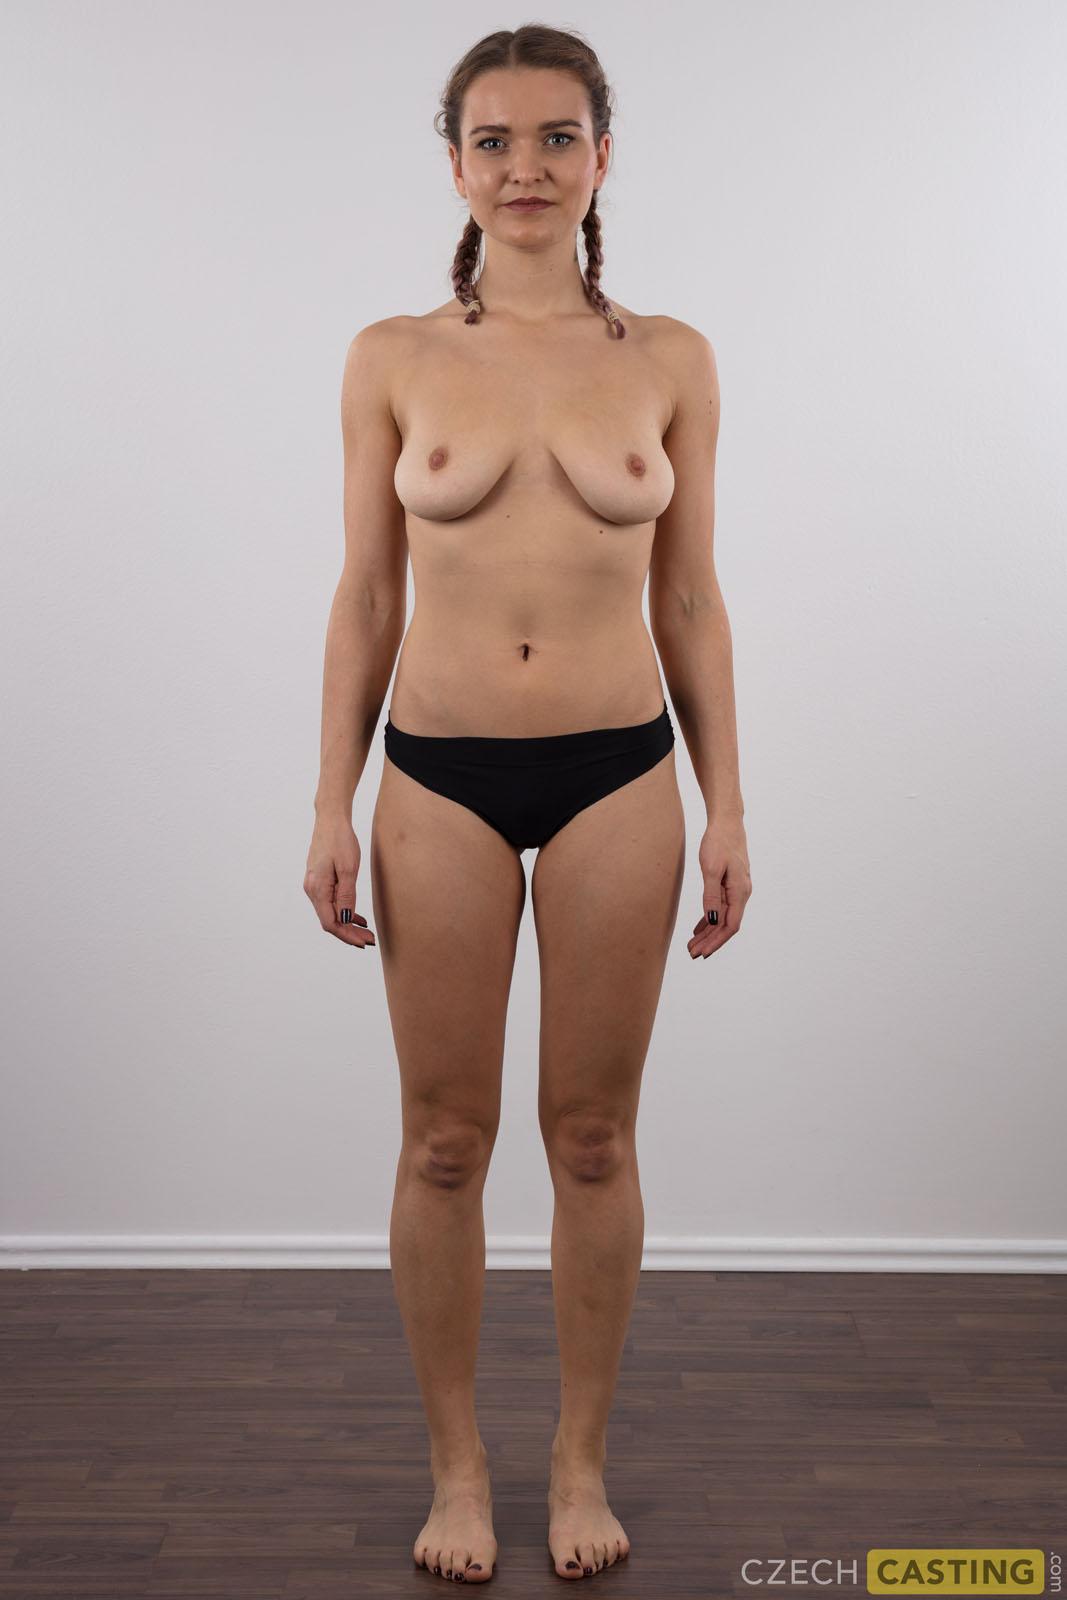 Free sex photos czech casting czechcasting model sideblond curvy indian aunties